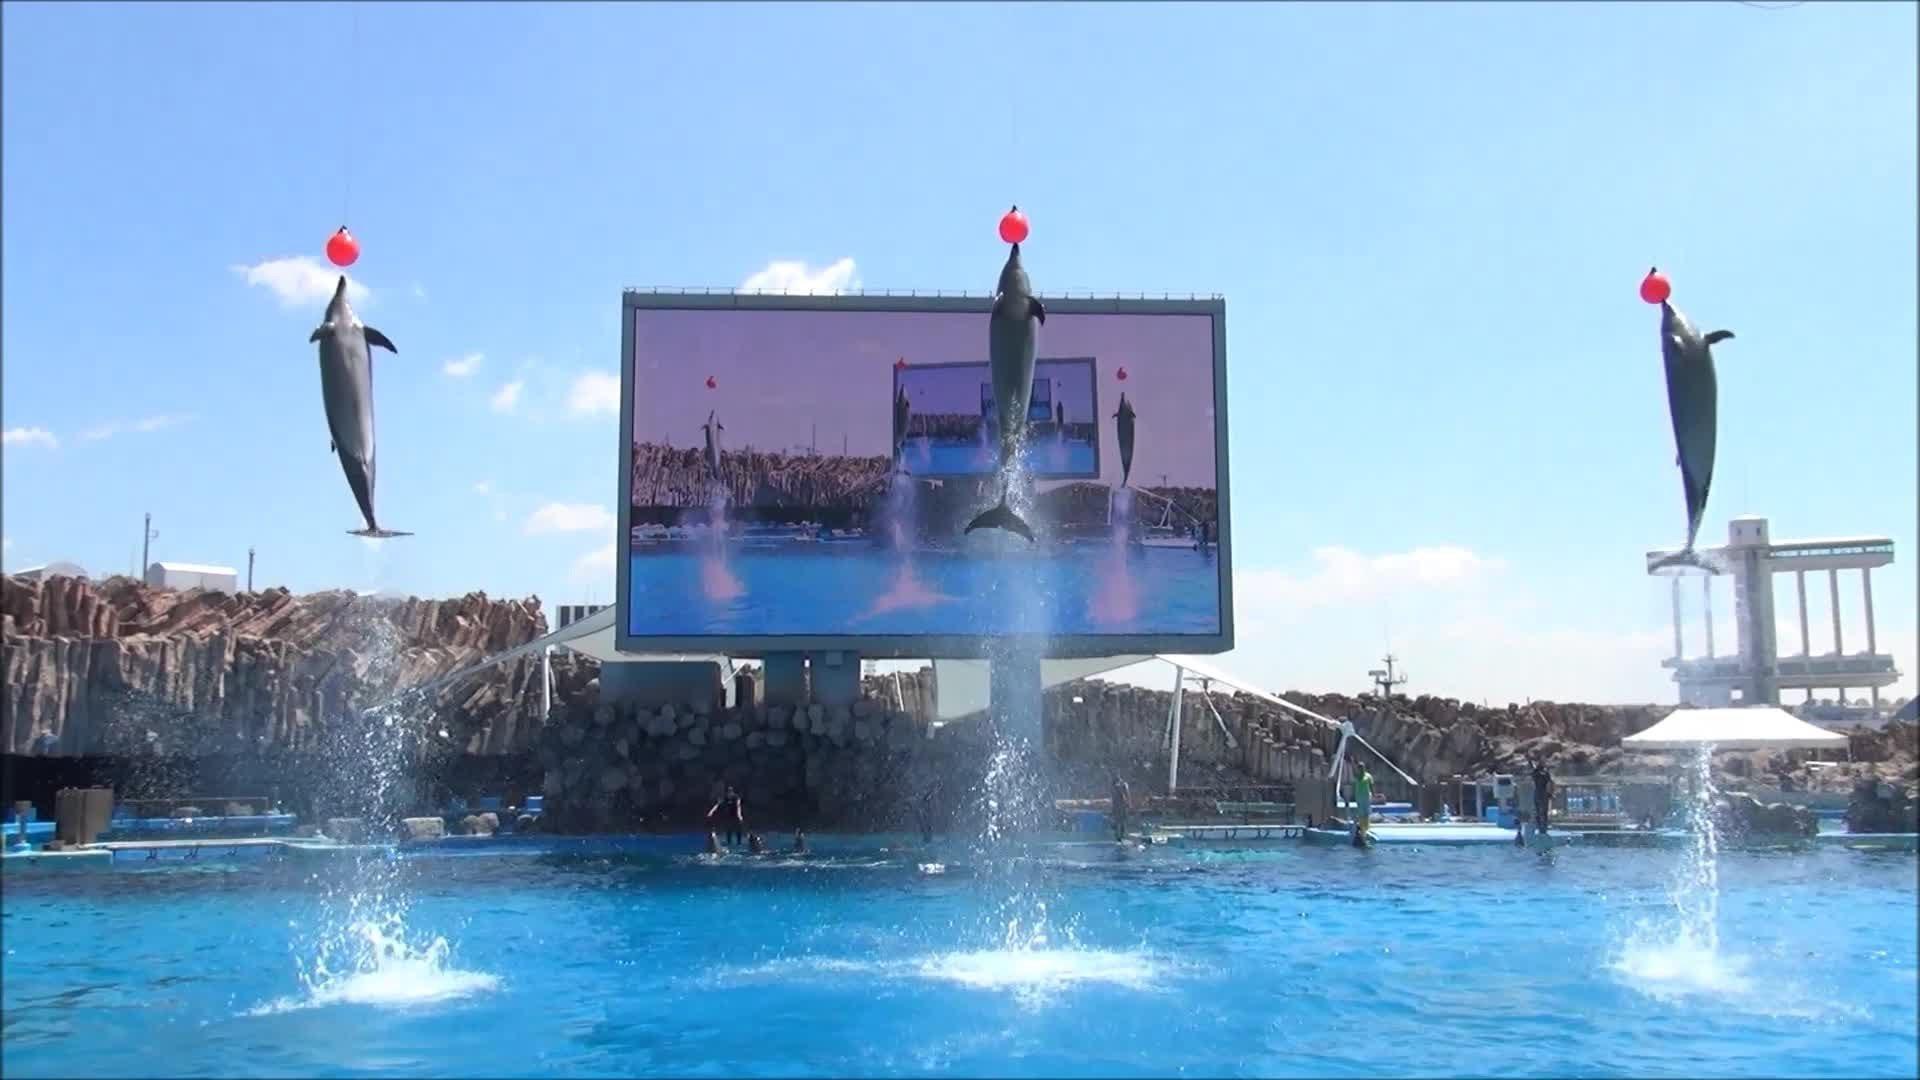 名古屋港水族館 イルカショー에 대한 이미지 검색결과